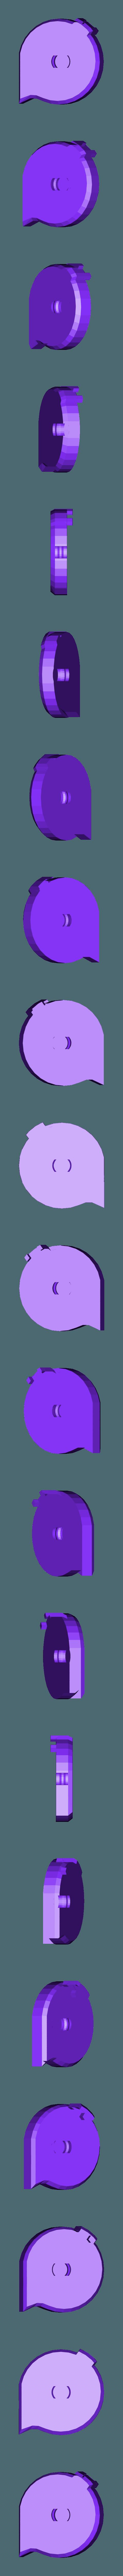 Cap_left_x_15_lying.stl Download free STL file Spinning Life Counter • 3D printing model, kejser